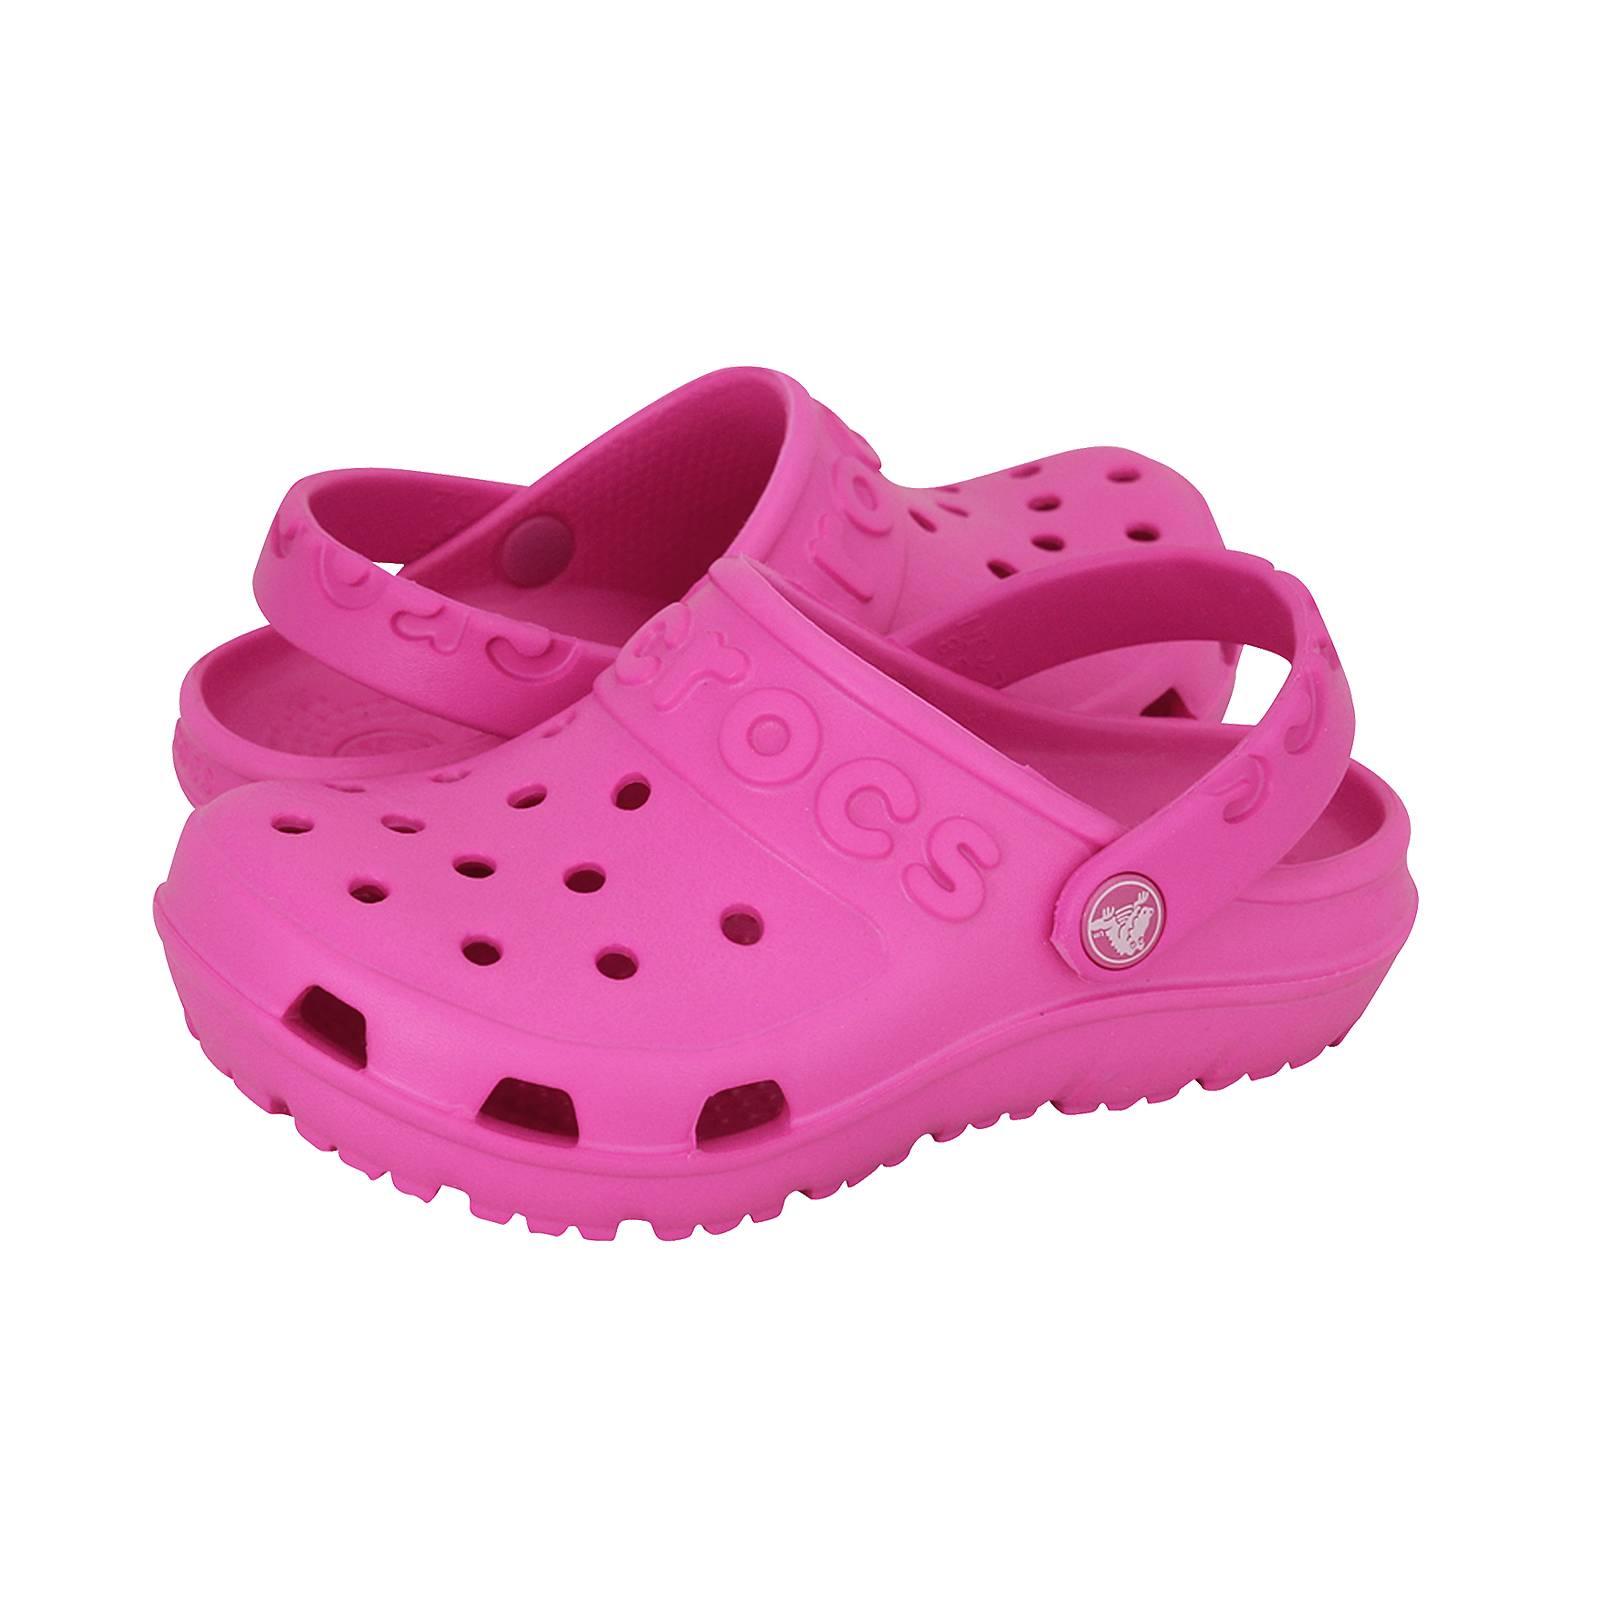 4ba1a76137ba Hilo Clog - Crocs Kids  clogs made of croslite - Gianna Kazakou Online